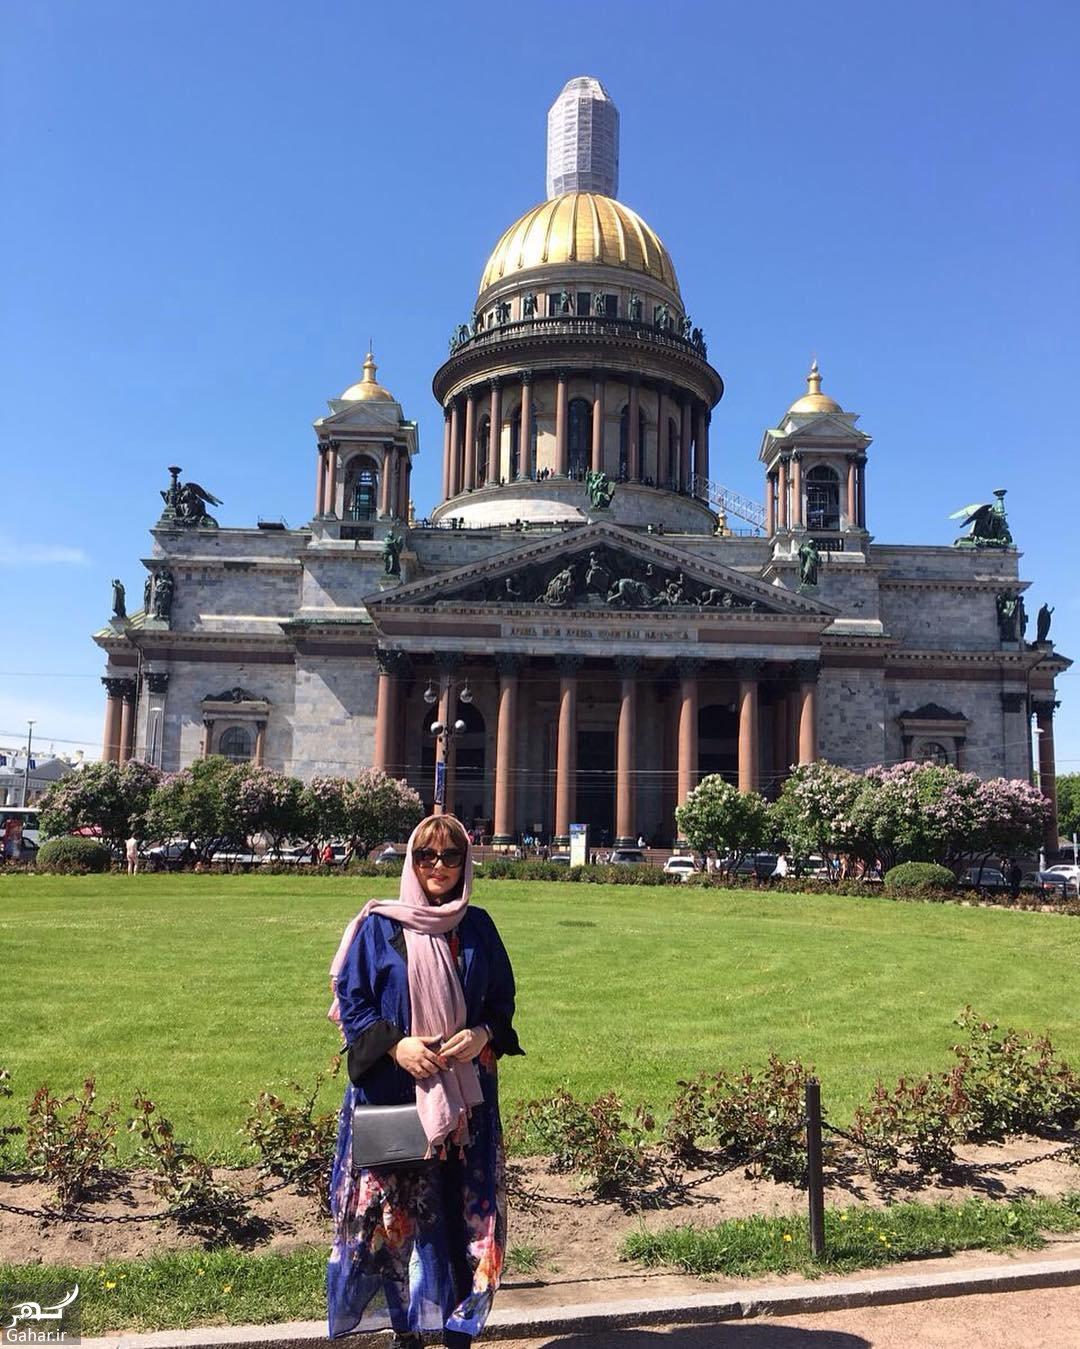 208273 Gahar ir سفر متفاوت لیلا برخورداری به روسیه + عکس های دیدنی